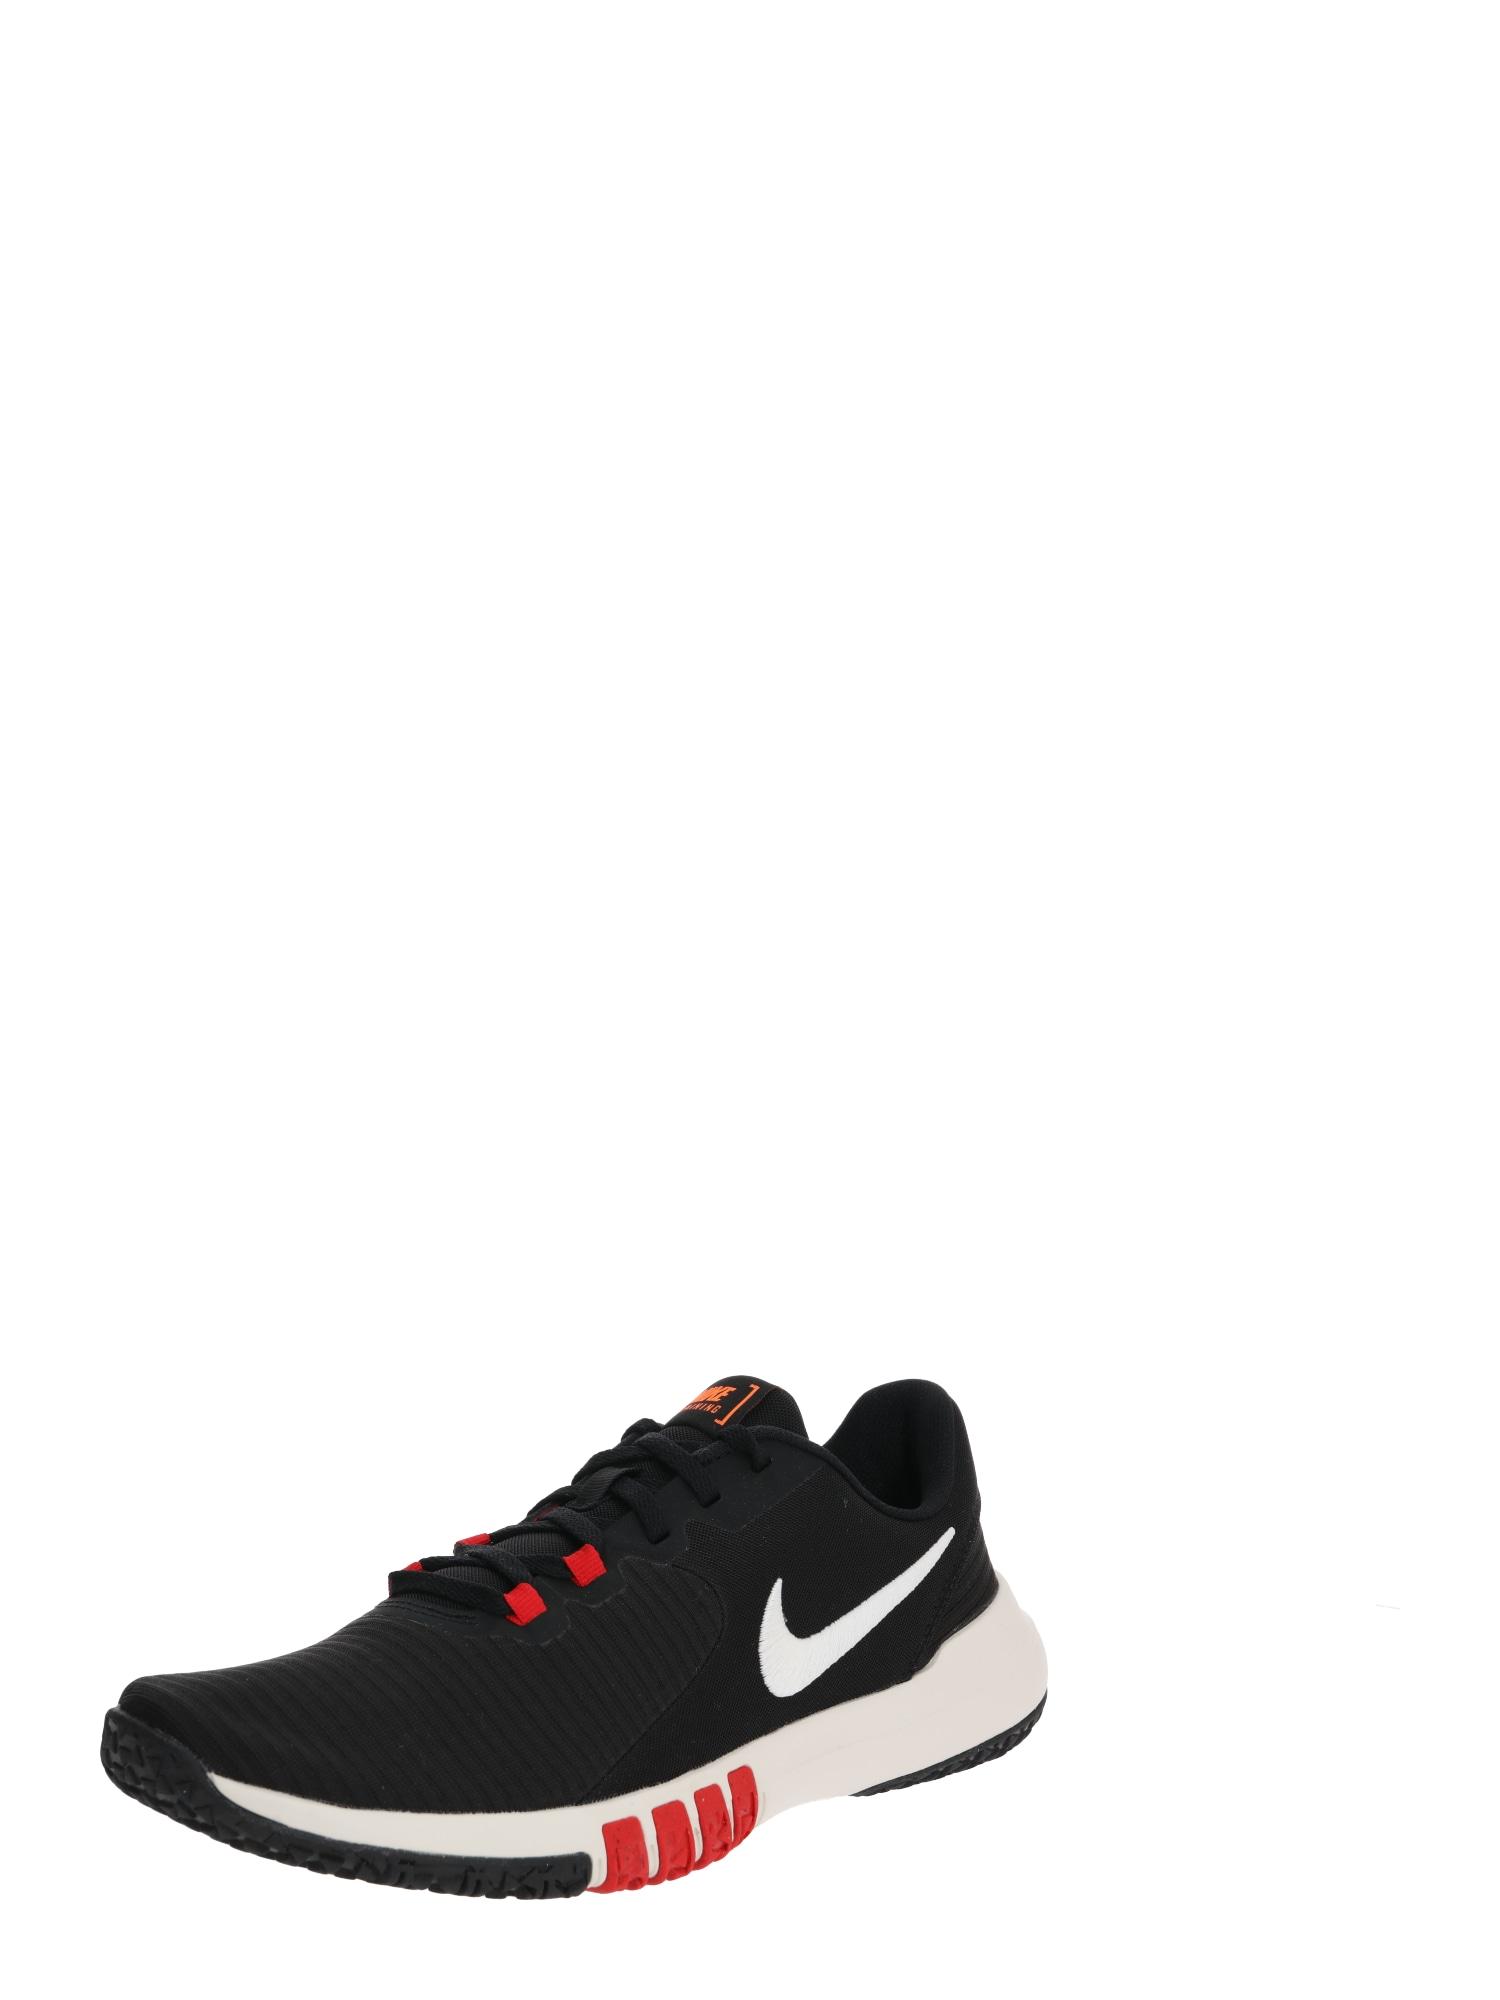 NIKE Bėgimo batai 'Flex Control 4' raudona / juoda / mėlyna